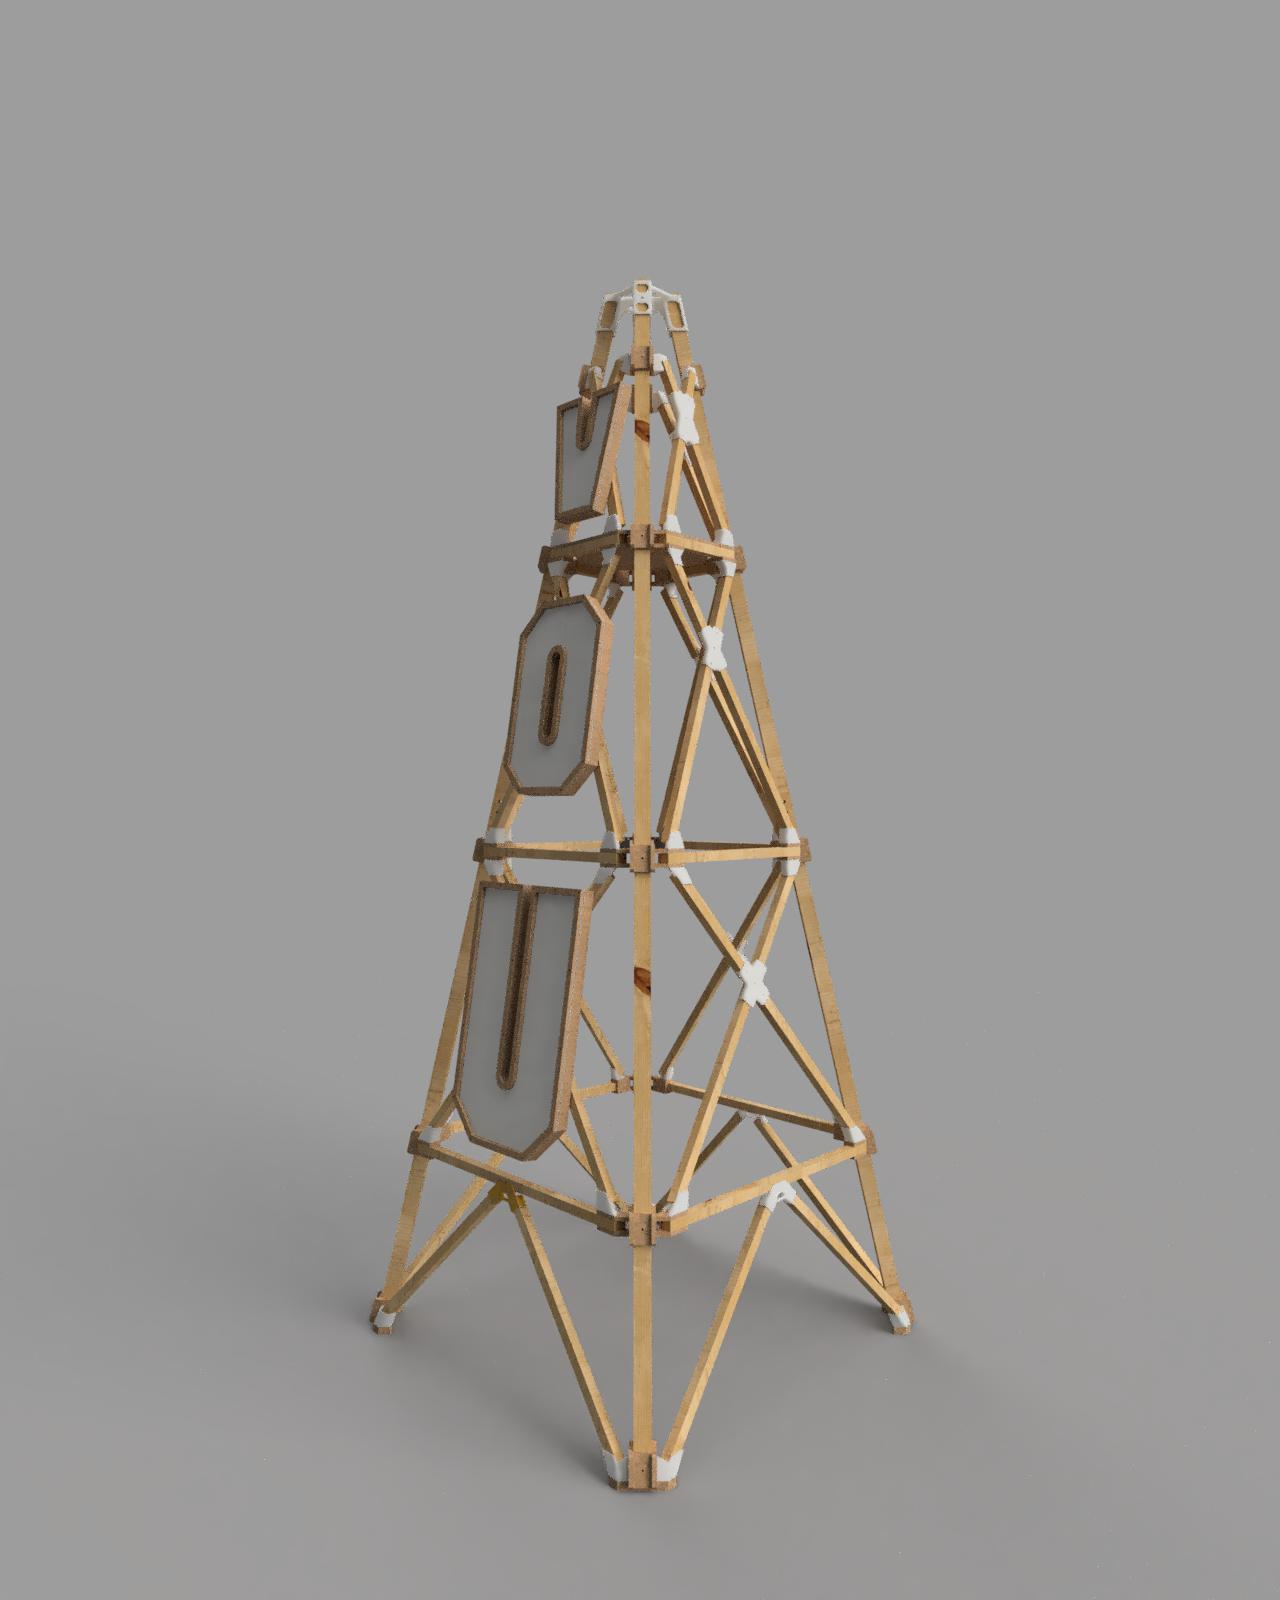 radio-tower-final_2018-Aug-06_05-16-28AM-000_CustomizedView4135768848.jpg